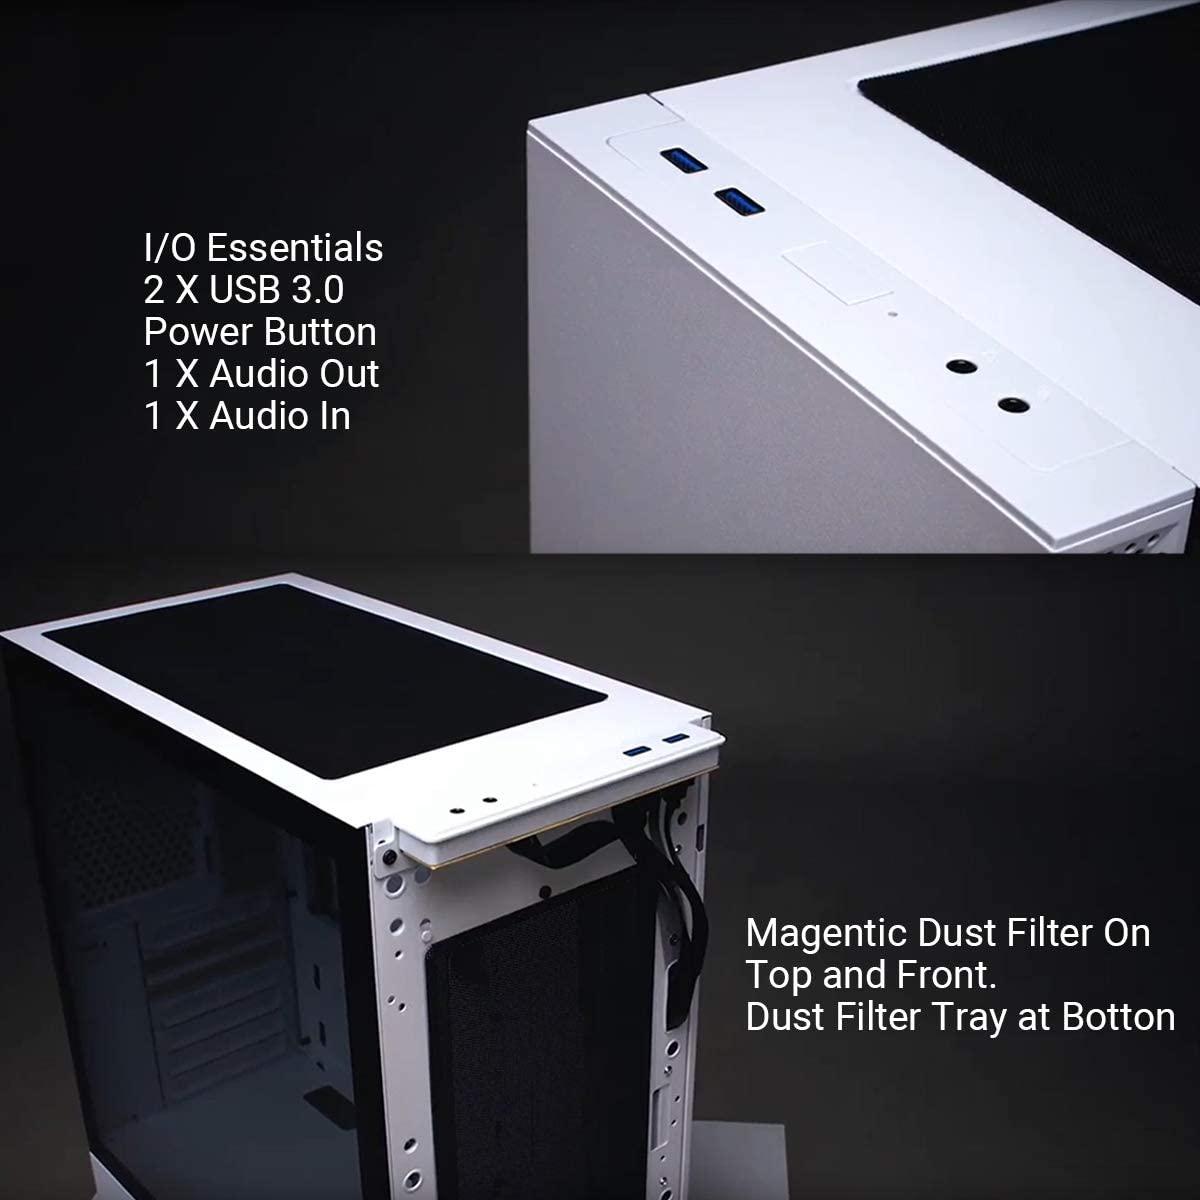 Lian Li LanCool 205 Mid-Tower ATX PC Gaming Case Black